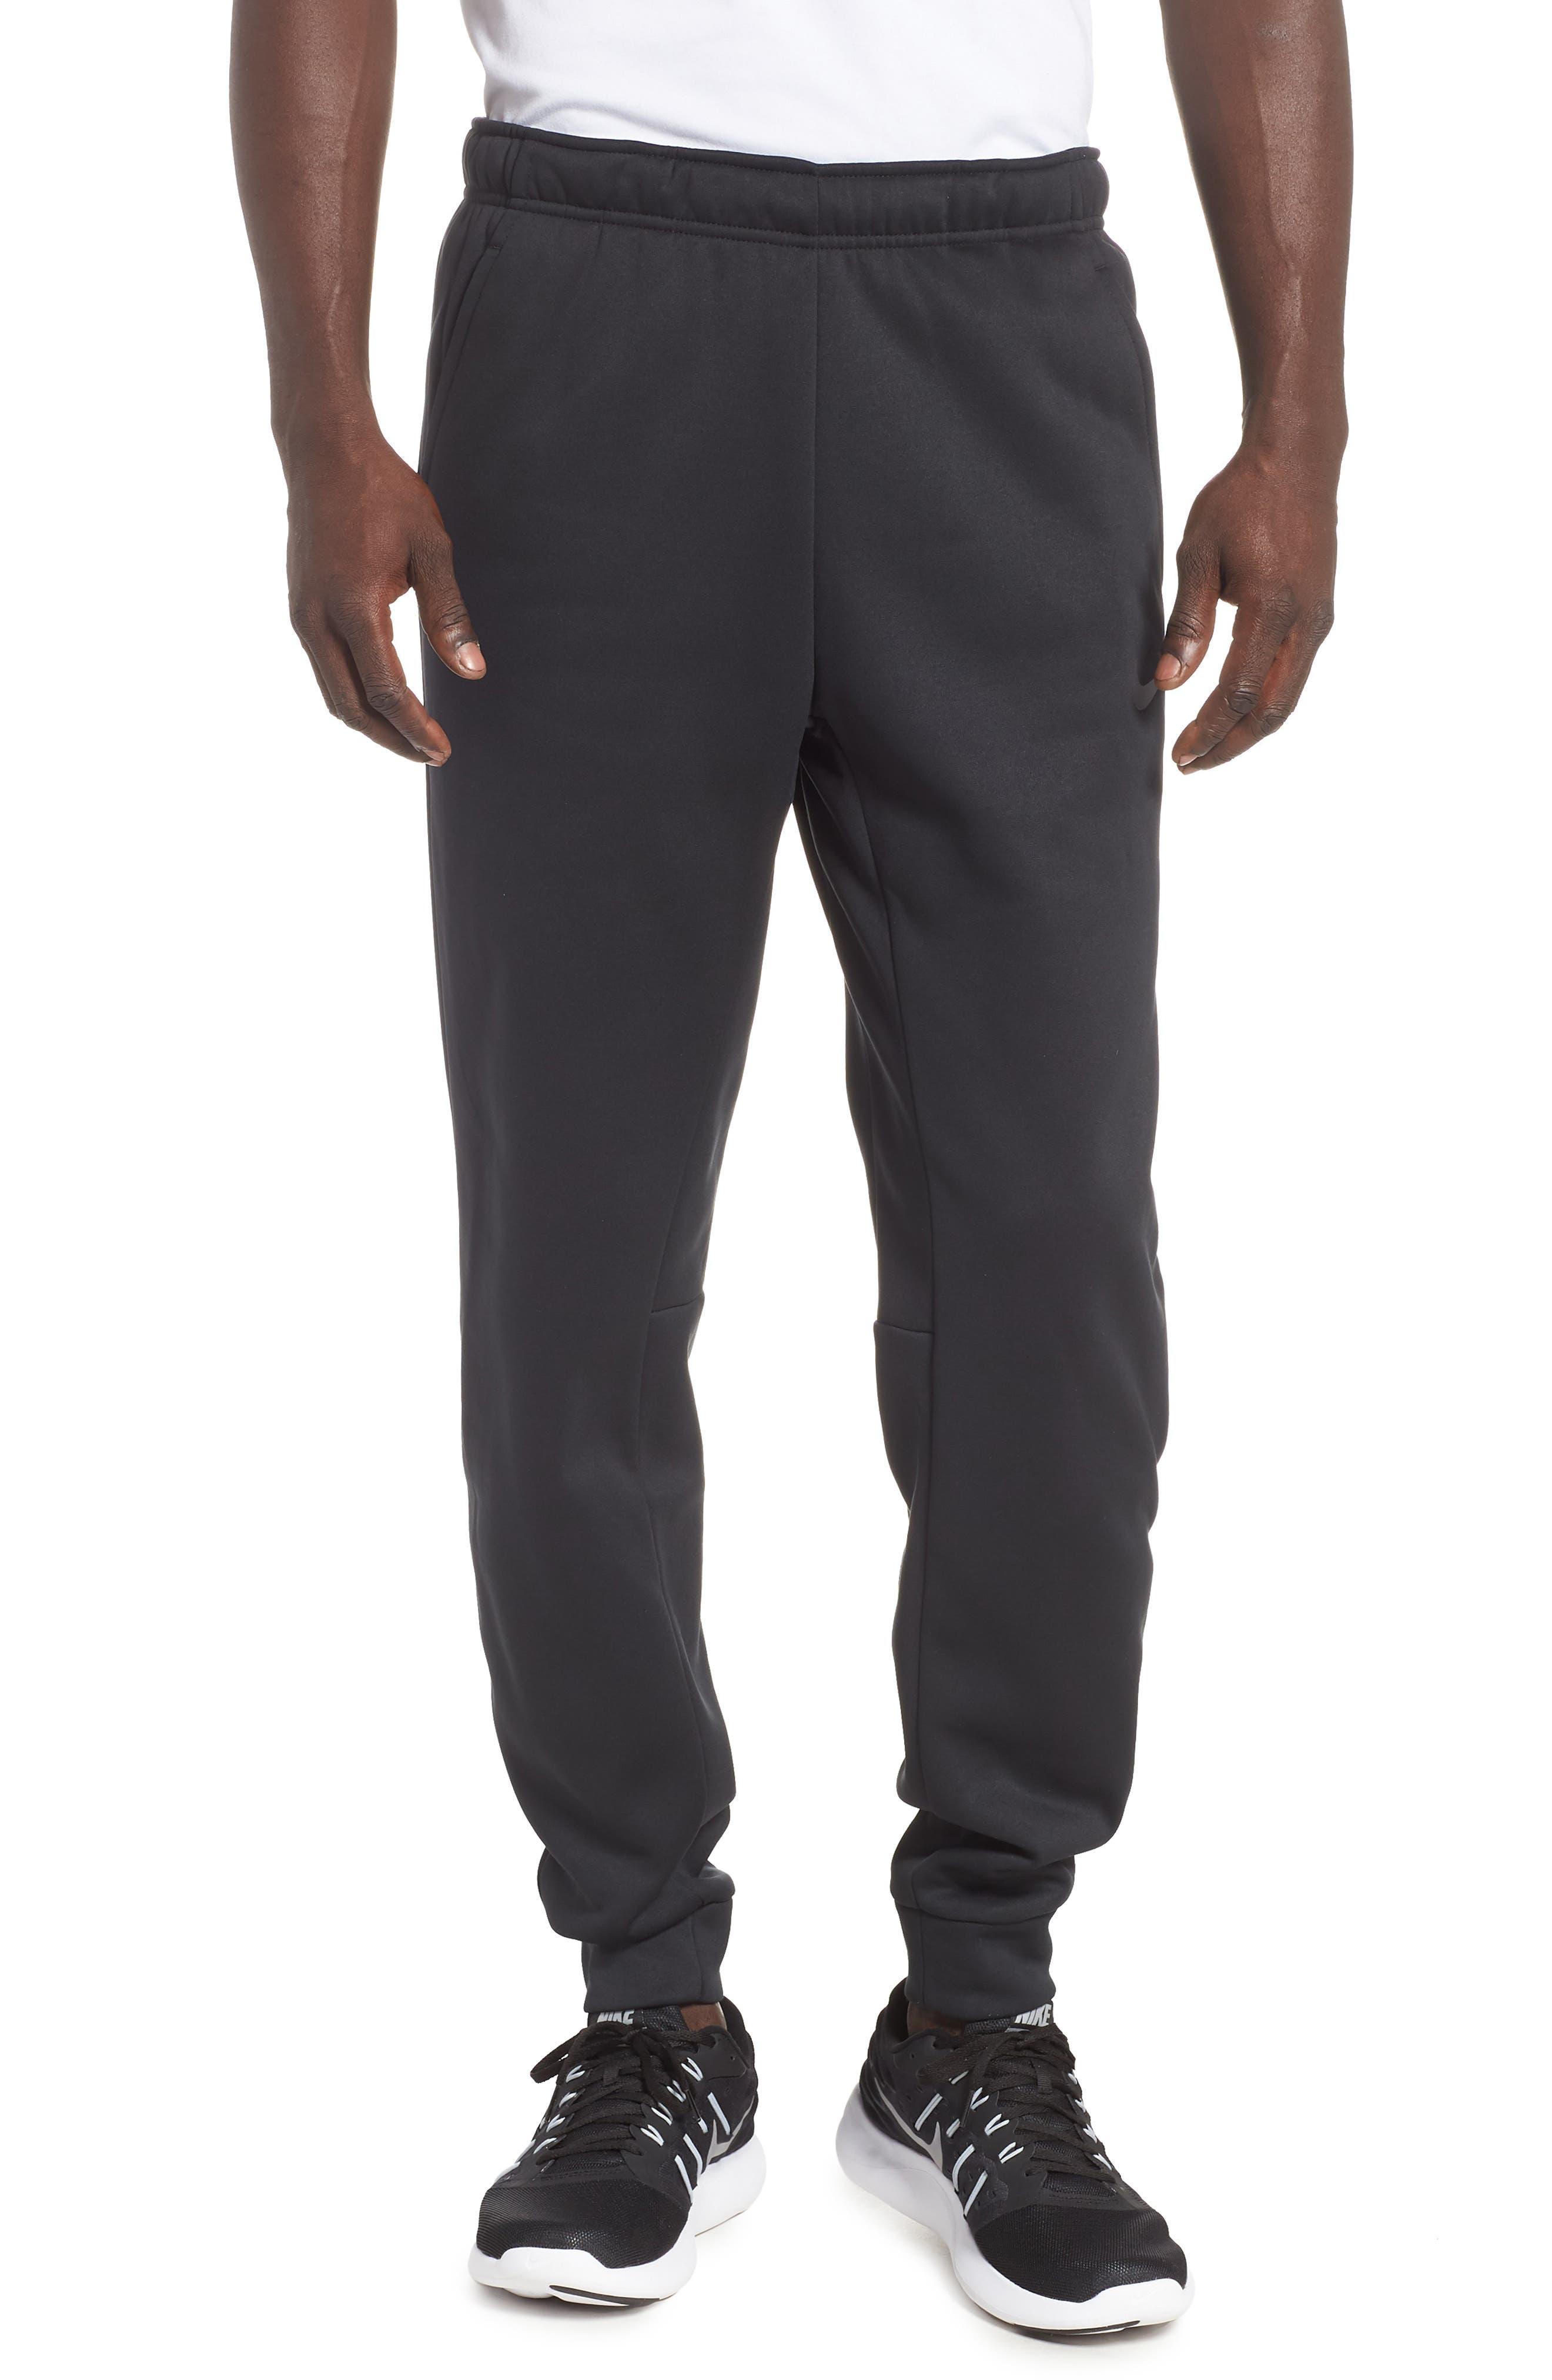 Dri-FIT Therma Training Pants,                             Main thumbnail 1, color,                             BLACK/ METALLIC HEMATITE